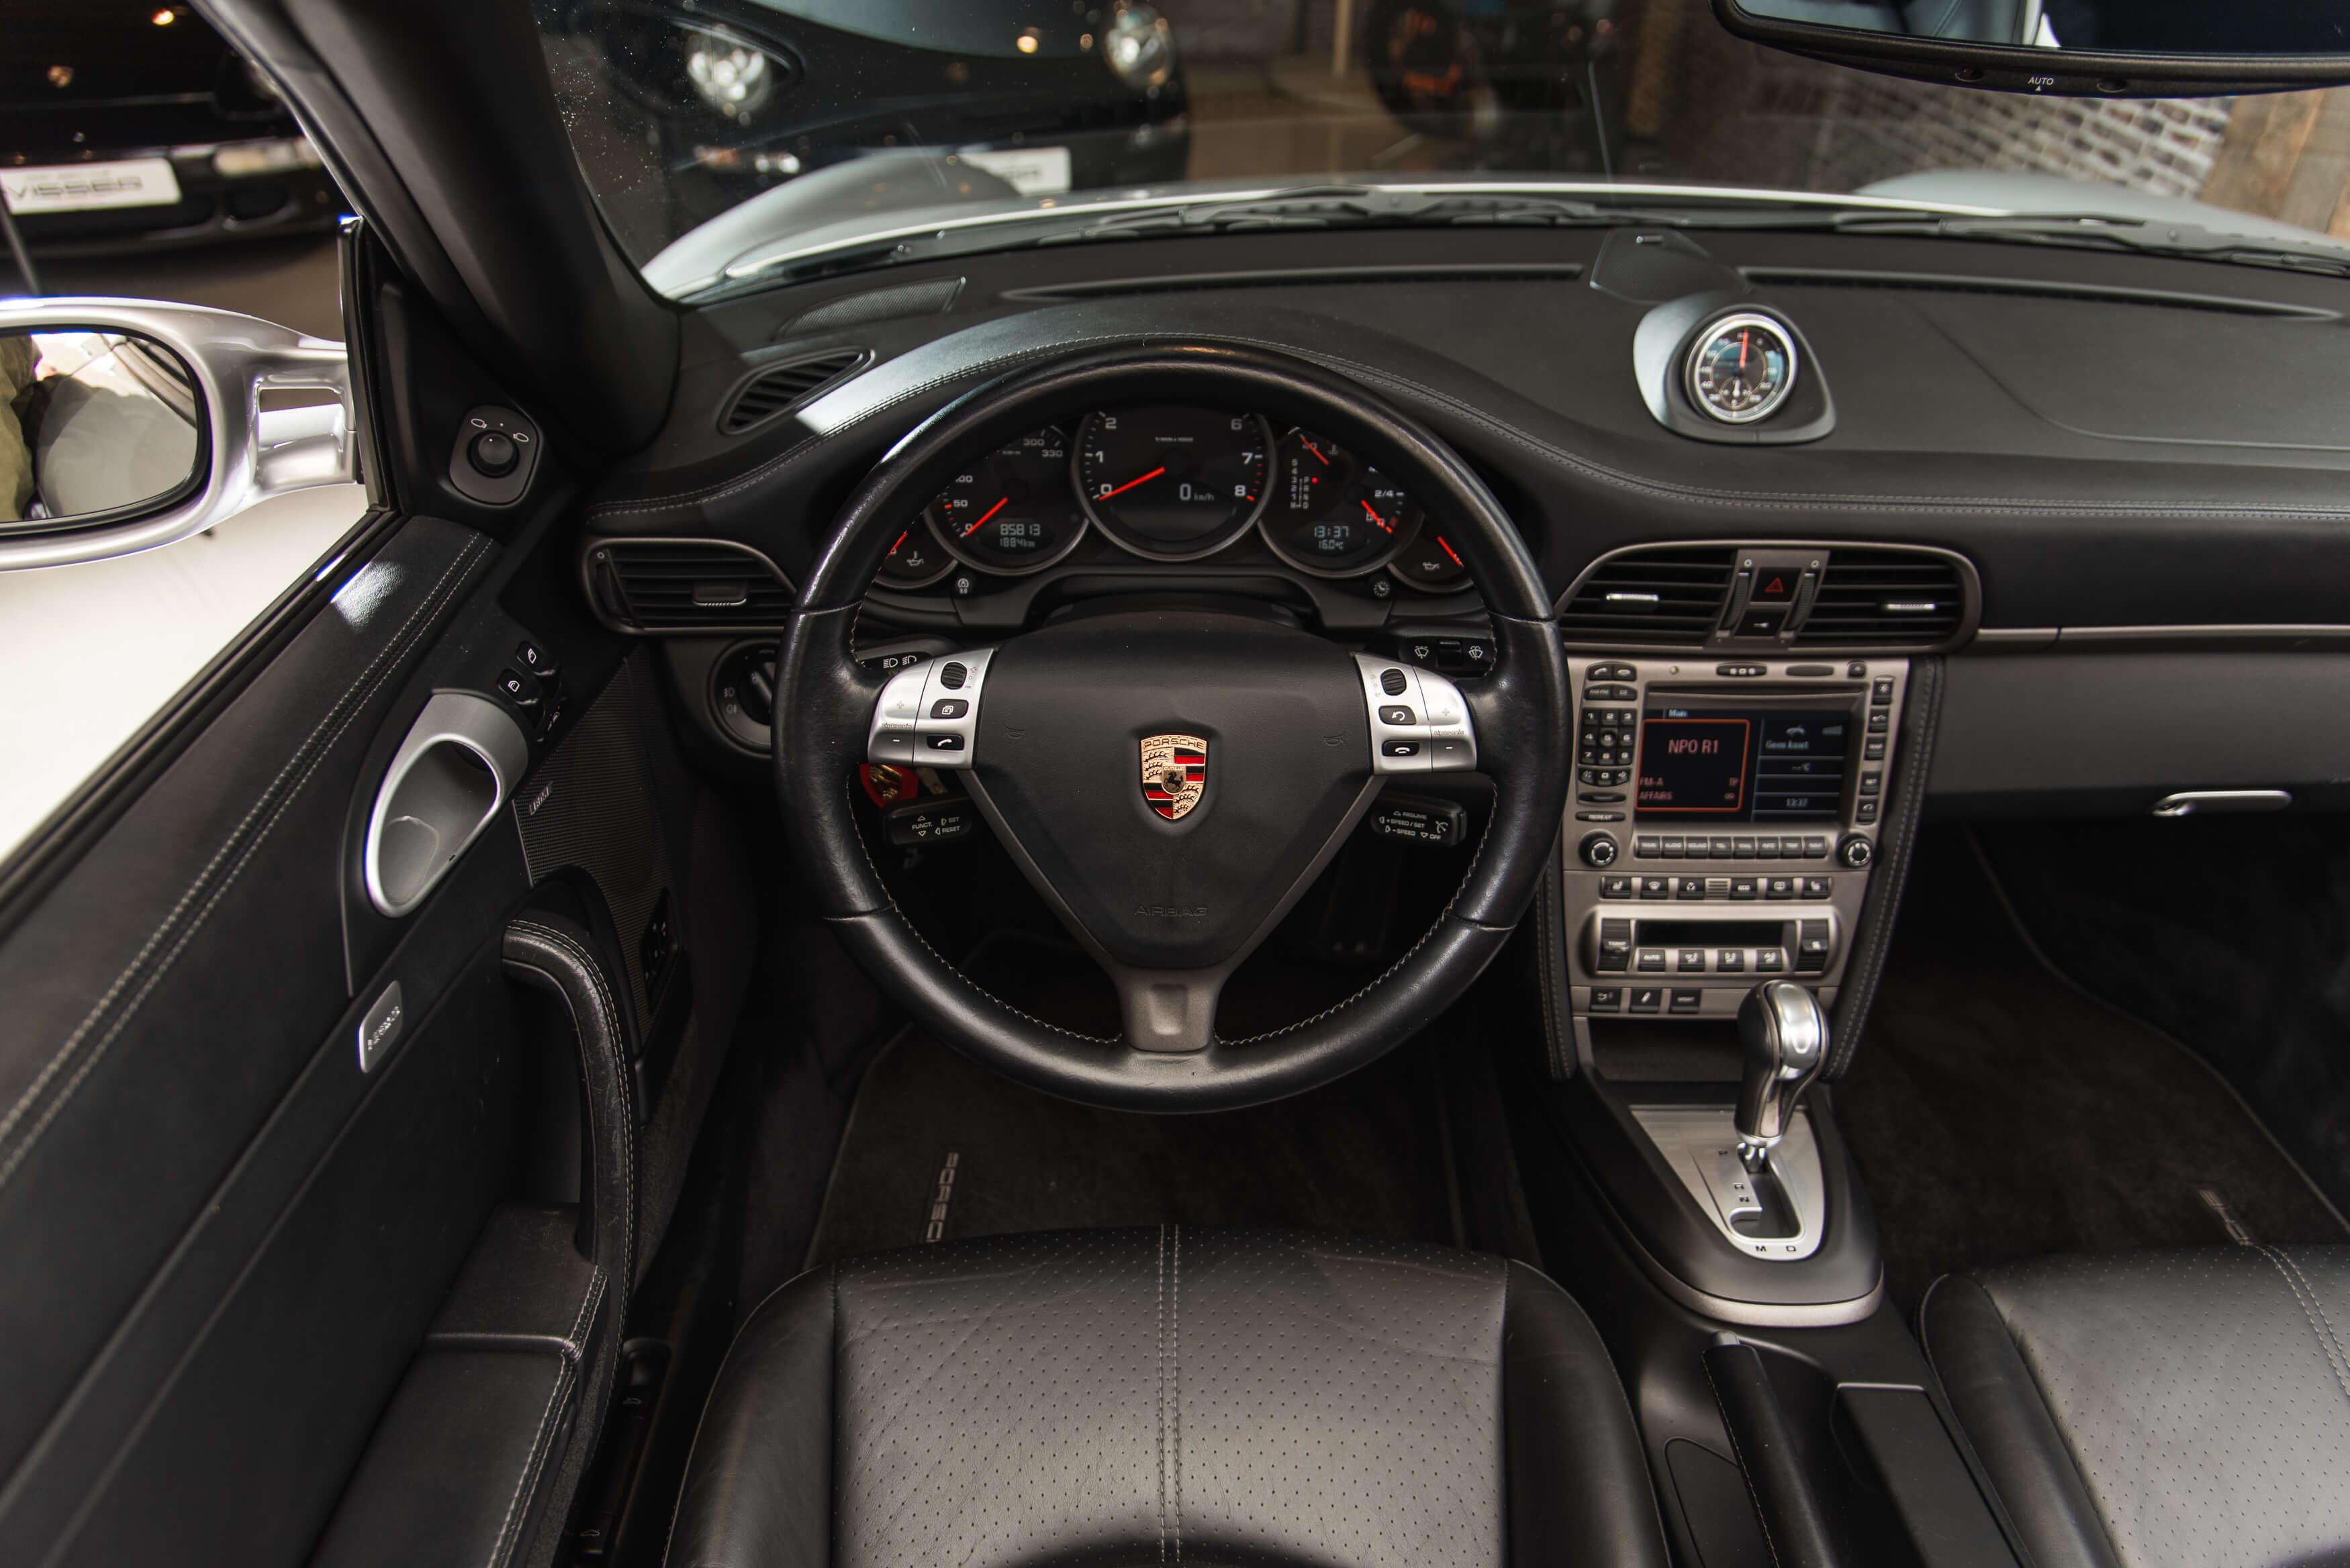 Porsche 997 Carrera 2 automaat Car Service Visser gespecialiseerd in Porsche - 17